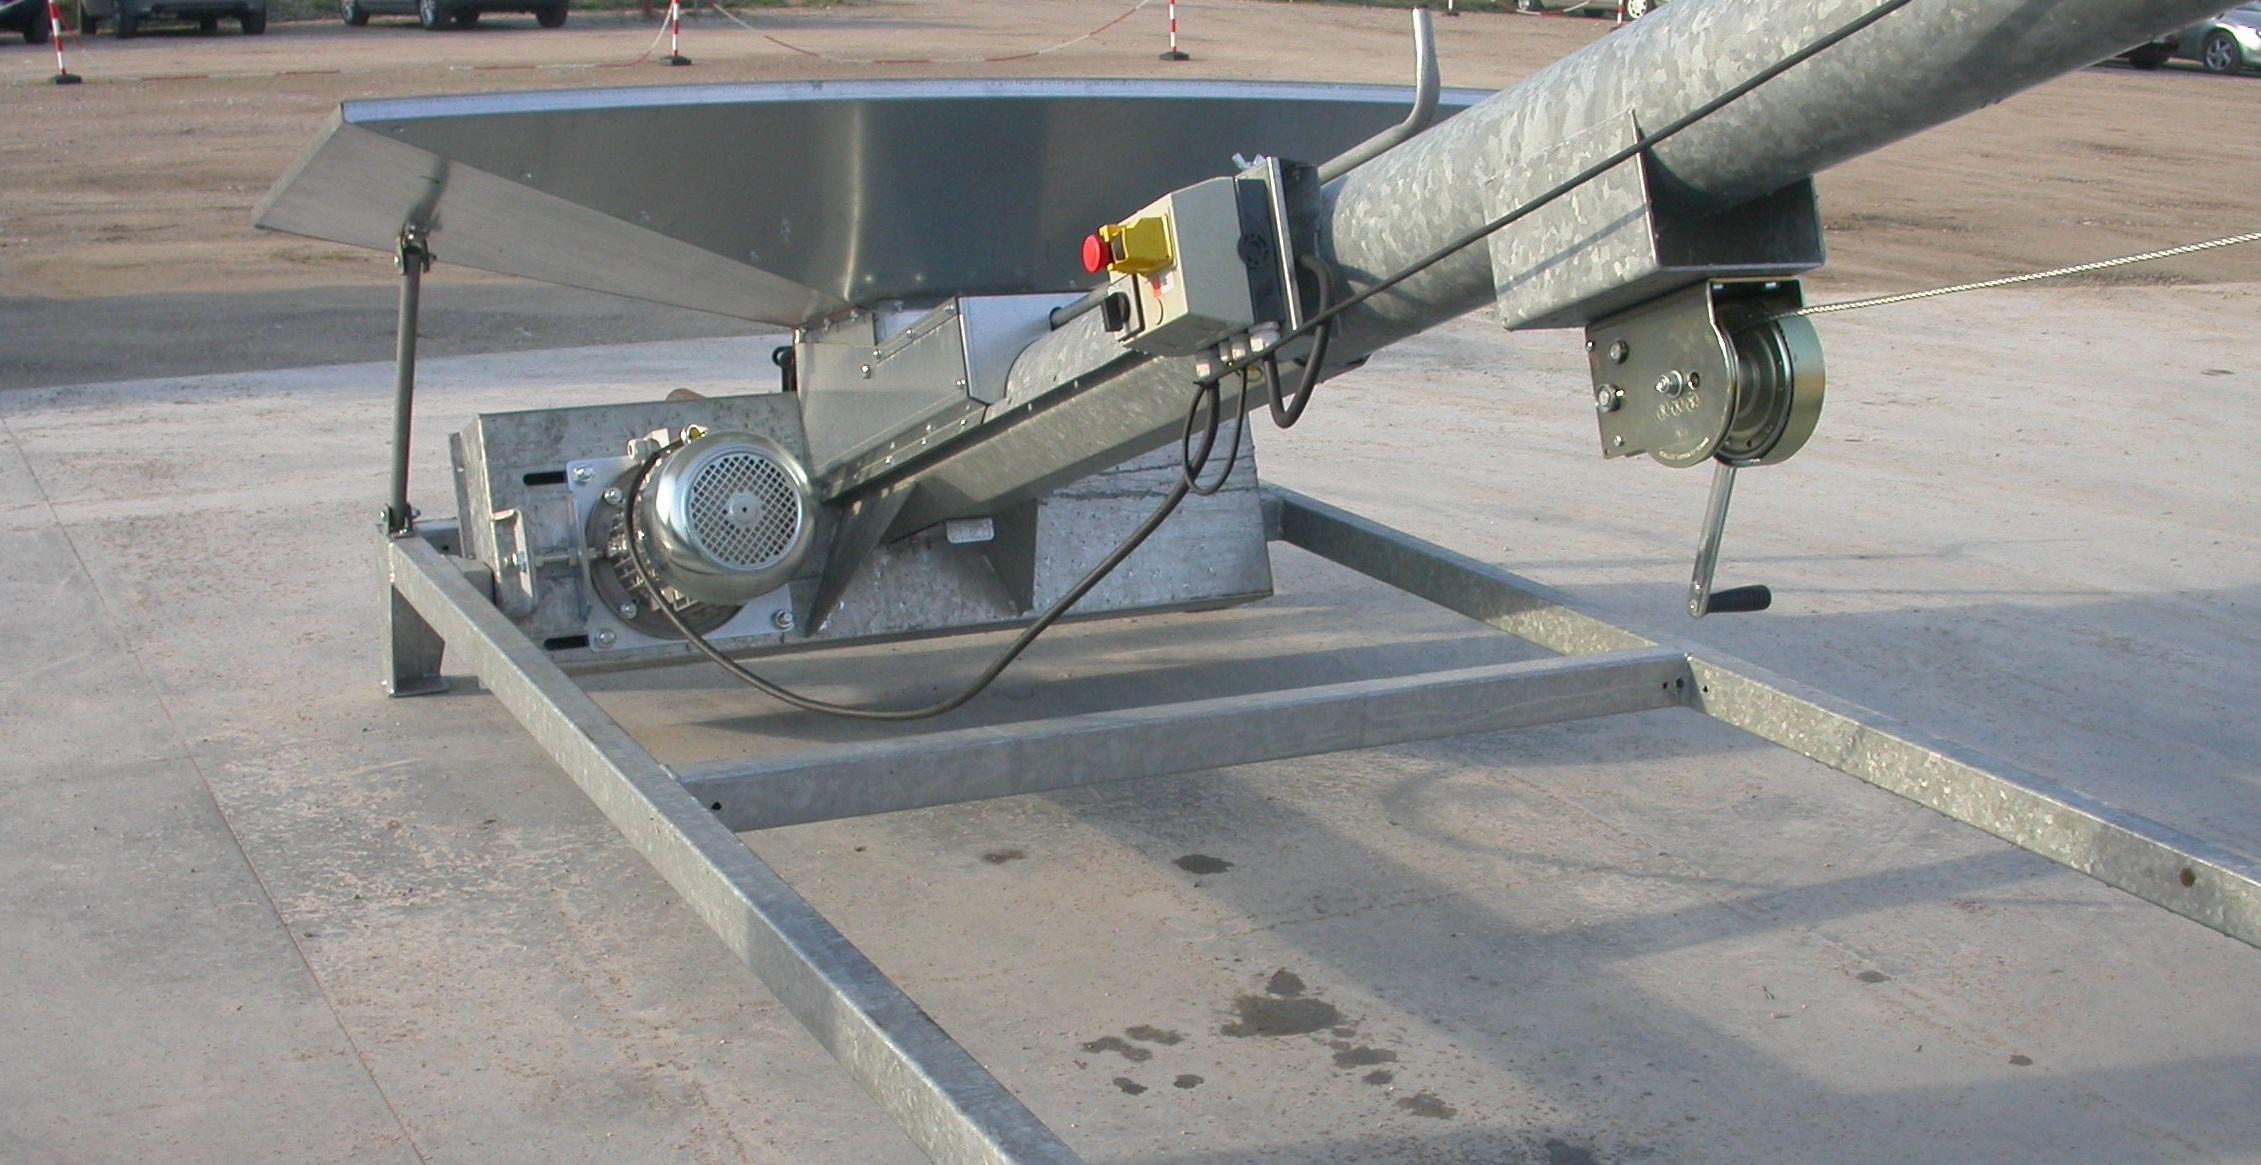 Towable screw conveyor SG series Portable Grain Auger